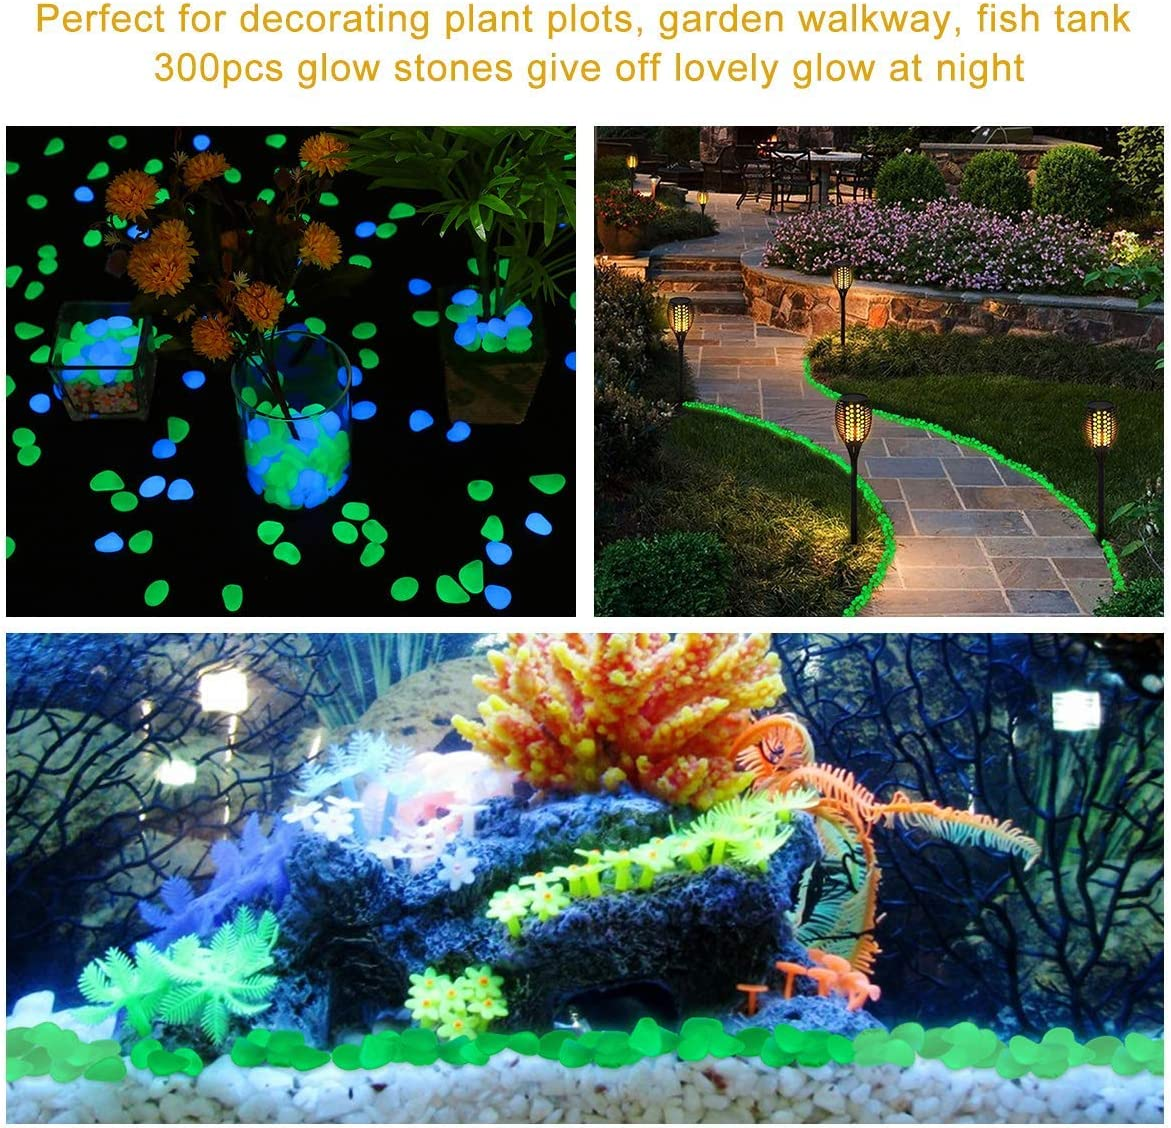 Blu Acquari ecc. Marciapiede Giardino Prato Tvird Decorative Stones Pebbles 300Pcs Outdoor Decorative Stones Pebbles Glow Stones Glow Ciottoli per stagni